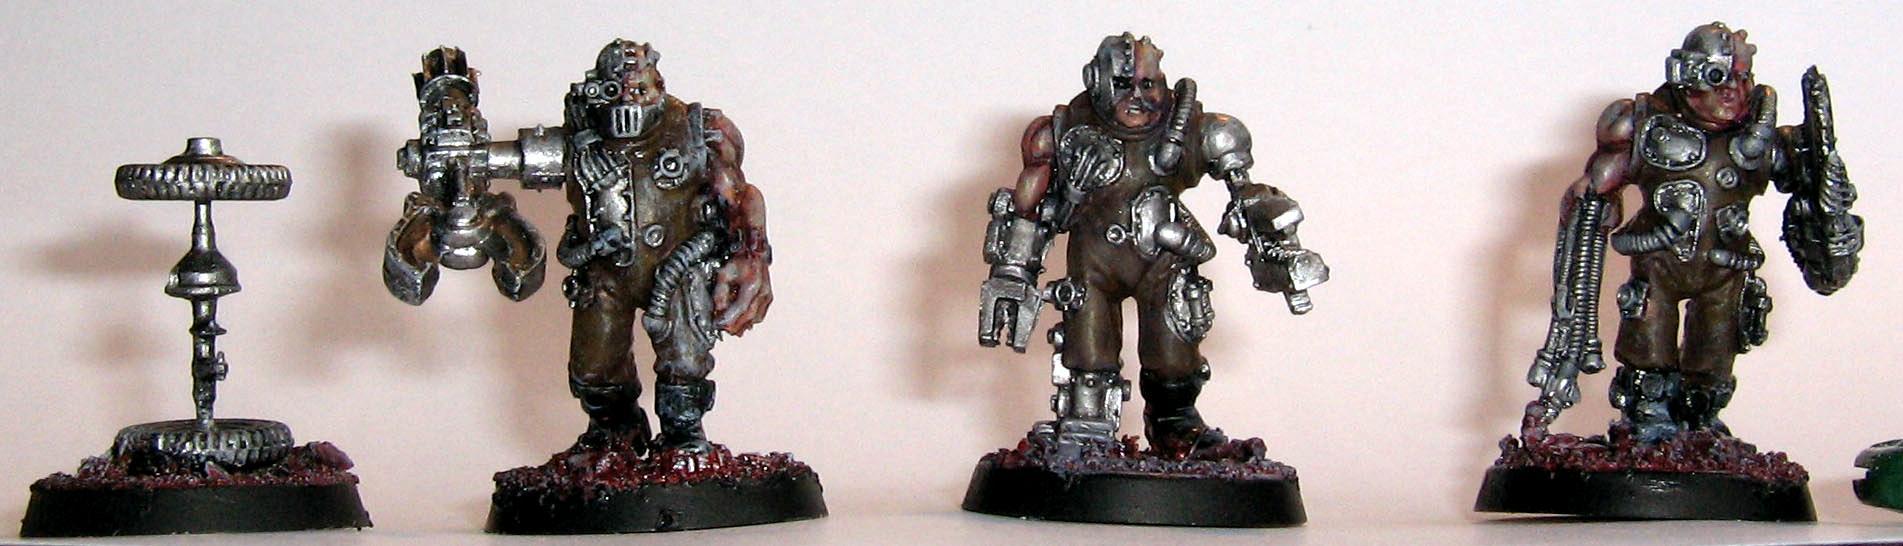 Adeptus Mechanicus, Servitors, Space Marines